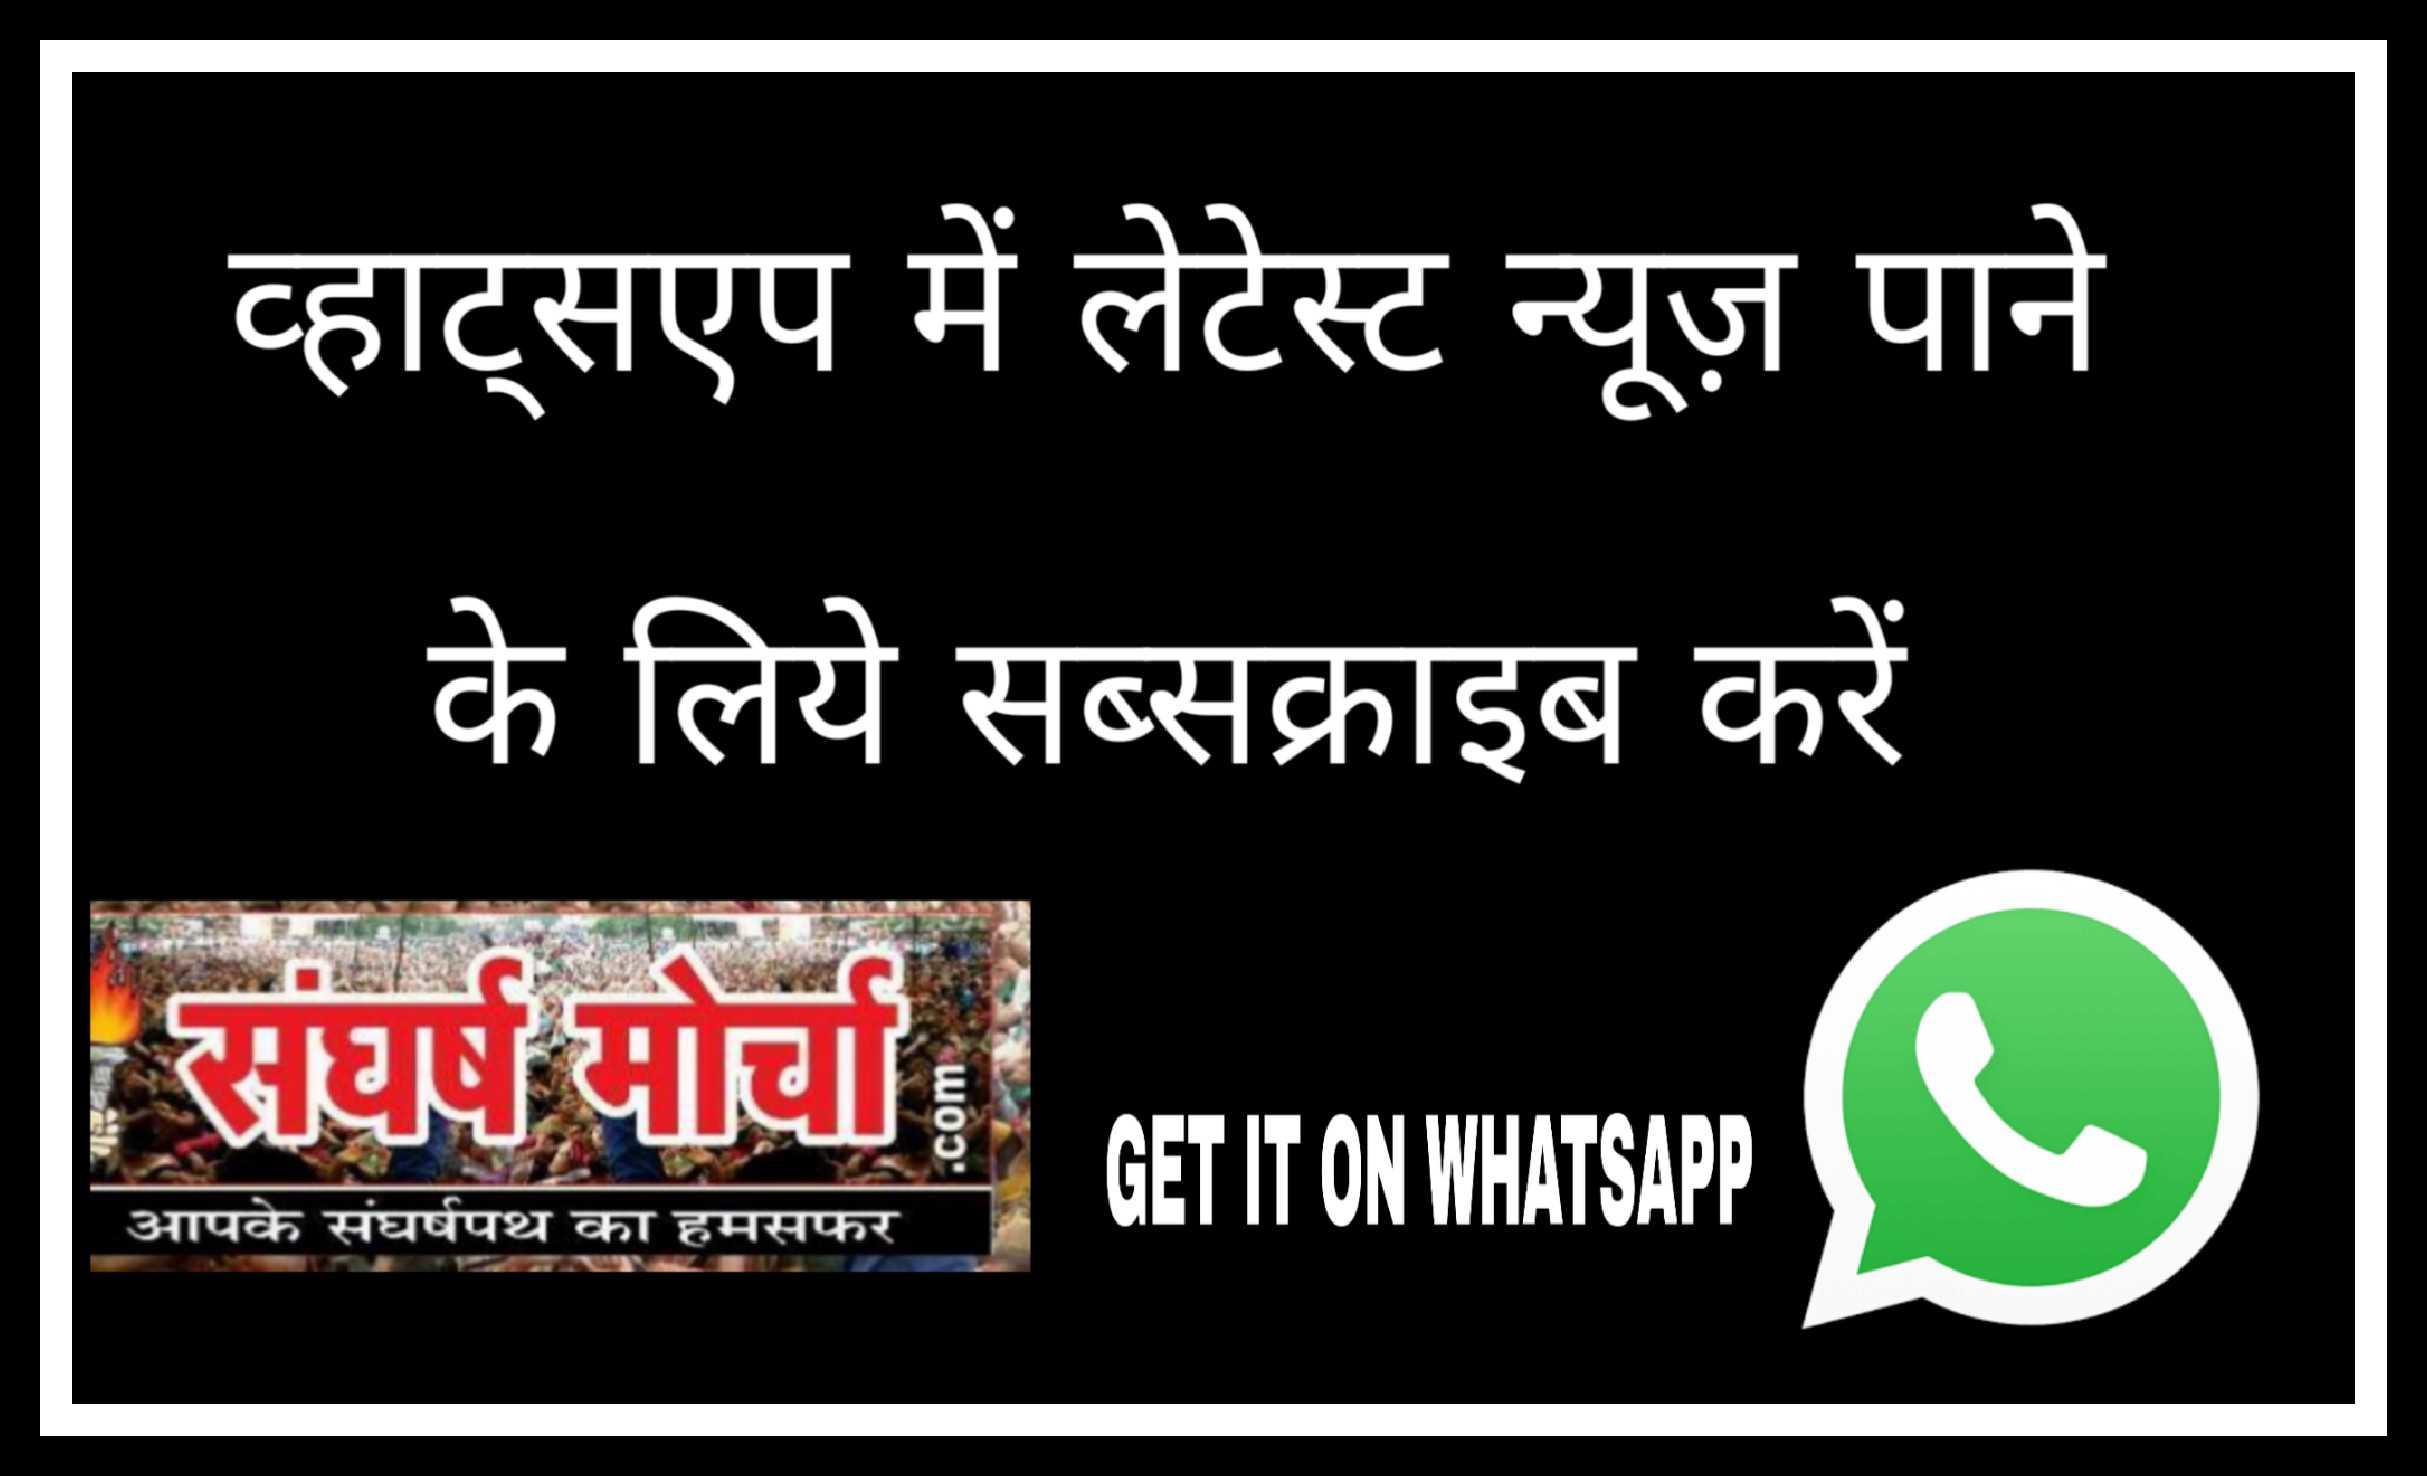 https://chat.whatsapp.com/INqQA9BXxbk1Ve51aj7aJn